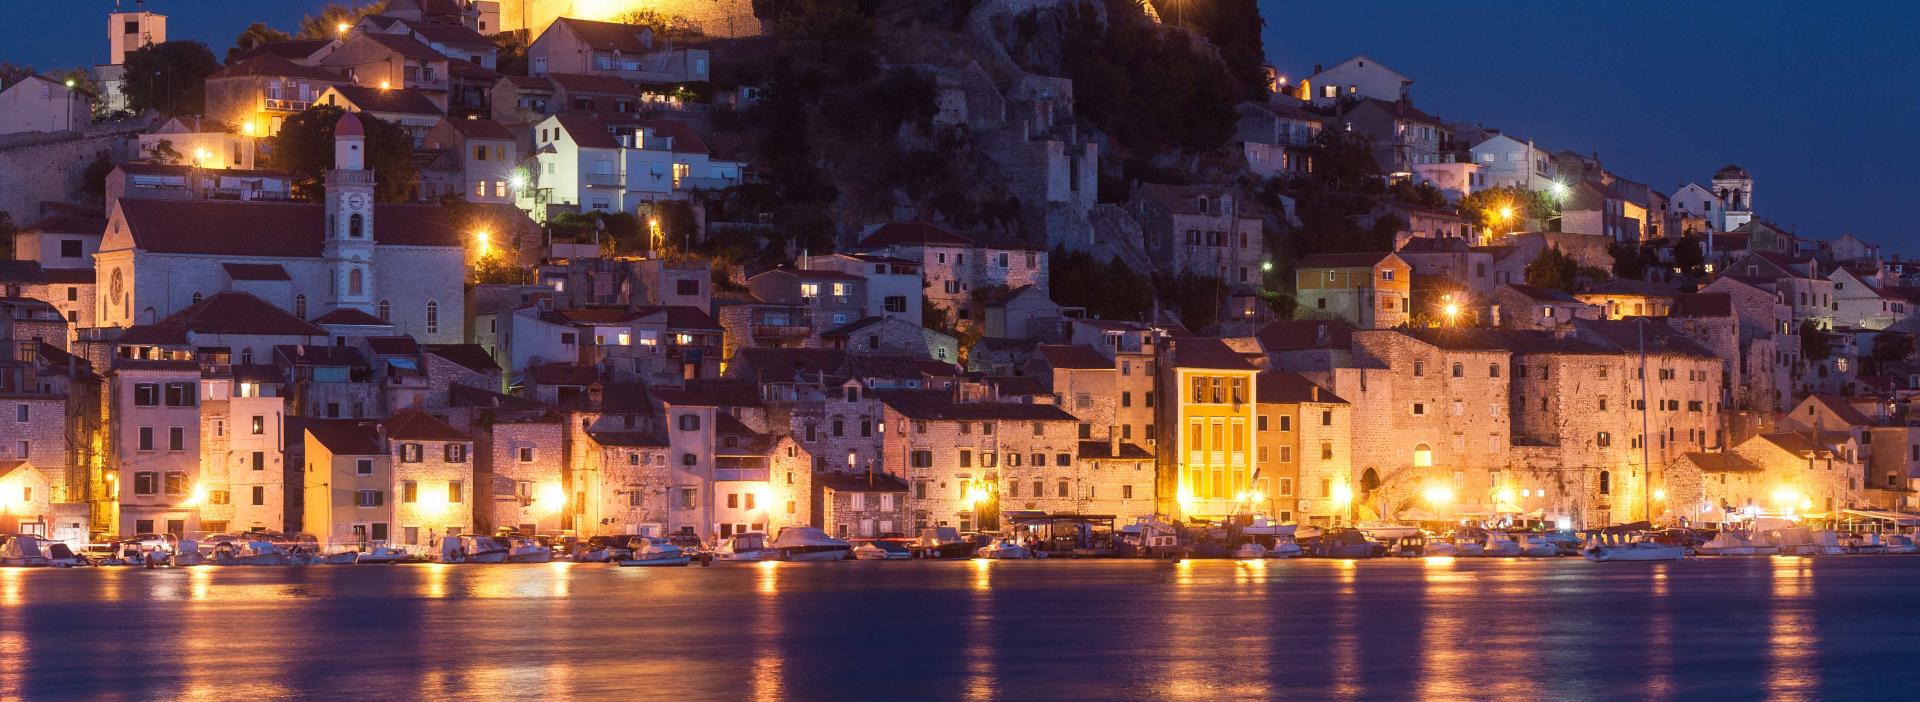 Republika Hrvatska se pridružila globalnoj platformi Mastercard Priceless Cities